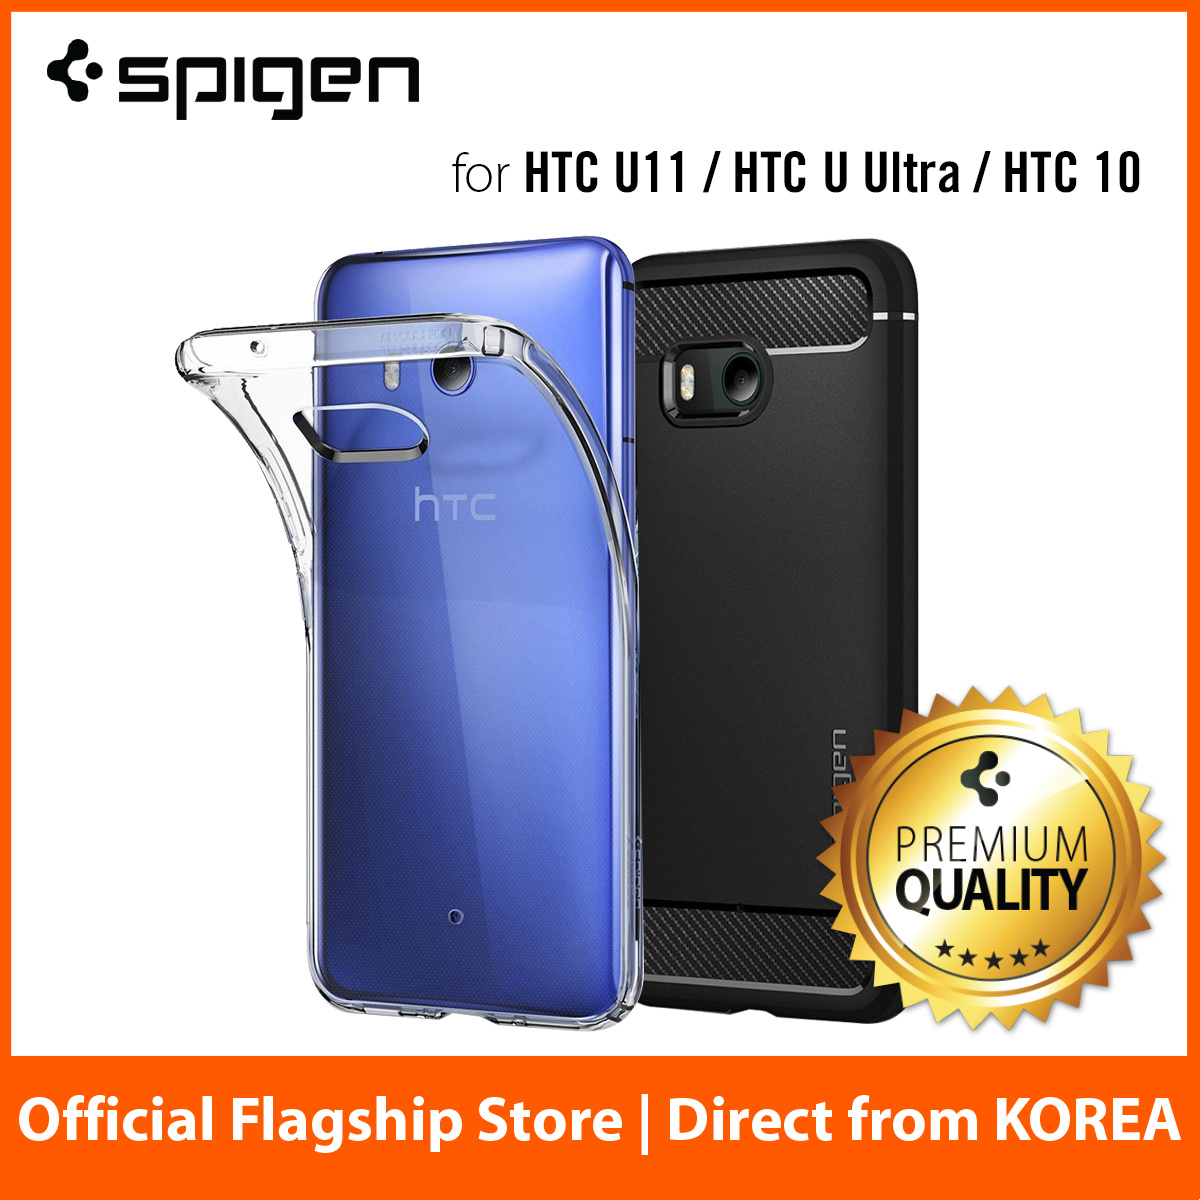 Qoo10 Spigen Htc U11 Mobile Accessories Galaxy Note 9 Case Ultra Hybrid Clear Original Casing Show All Item Images